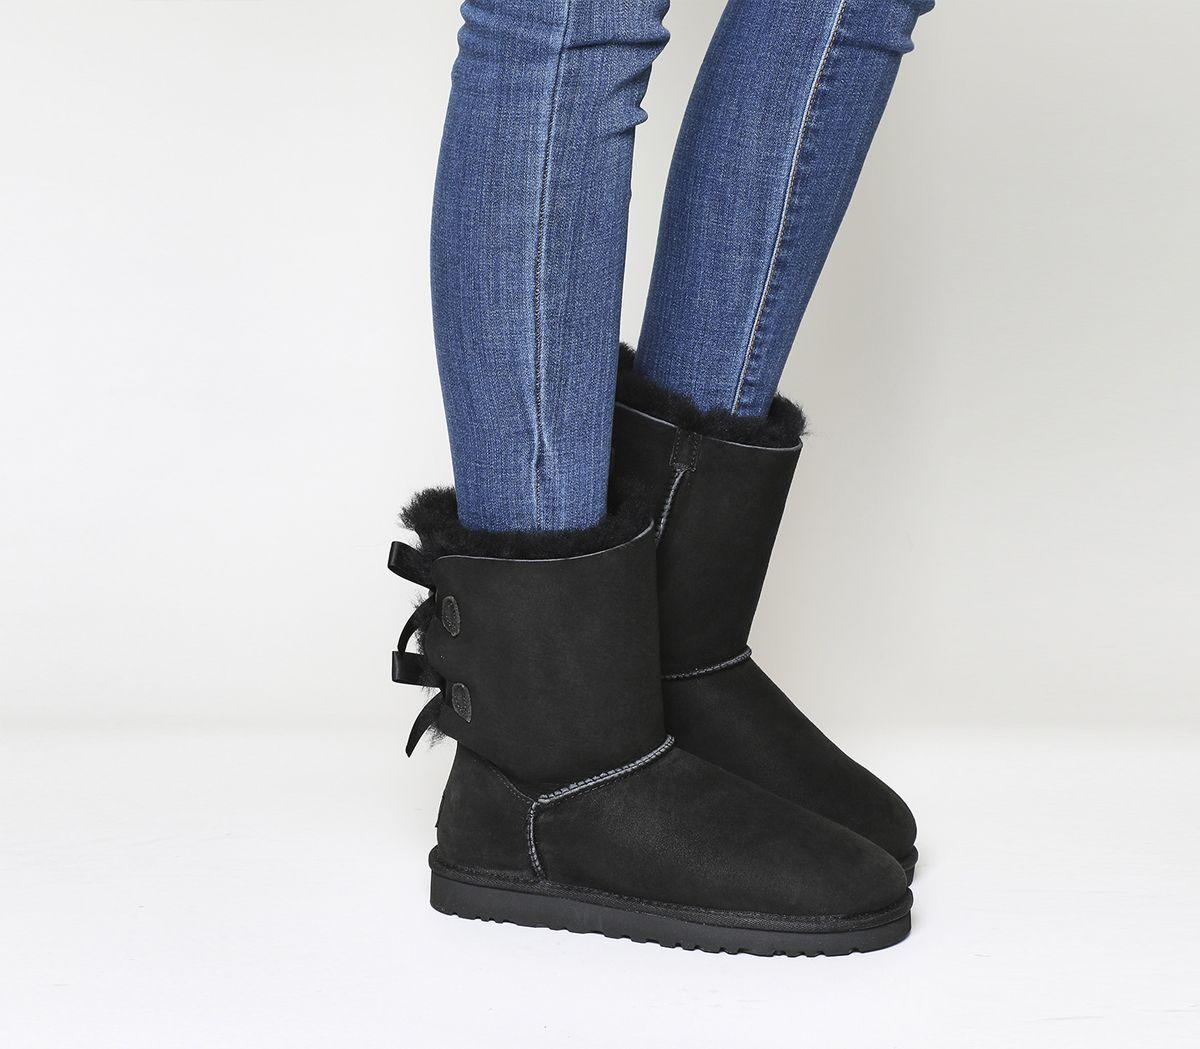 58d17367d55 Bailey Bow Calf boots